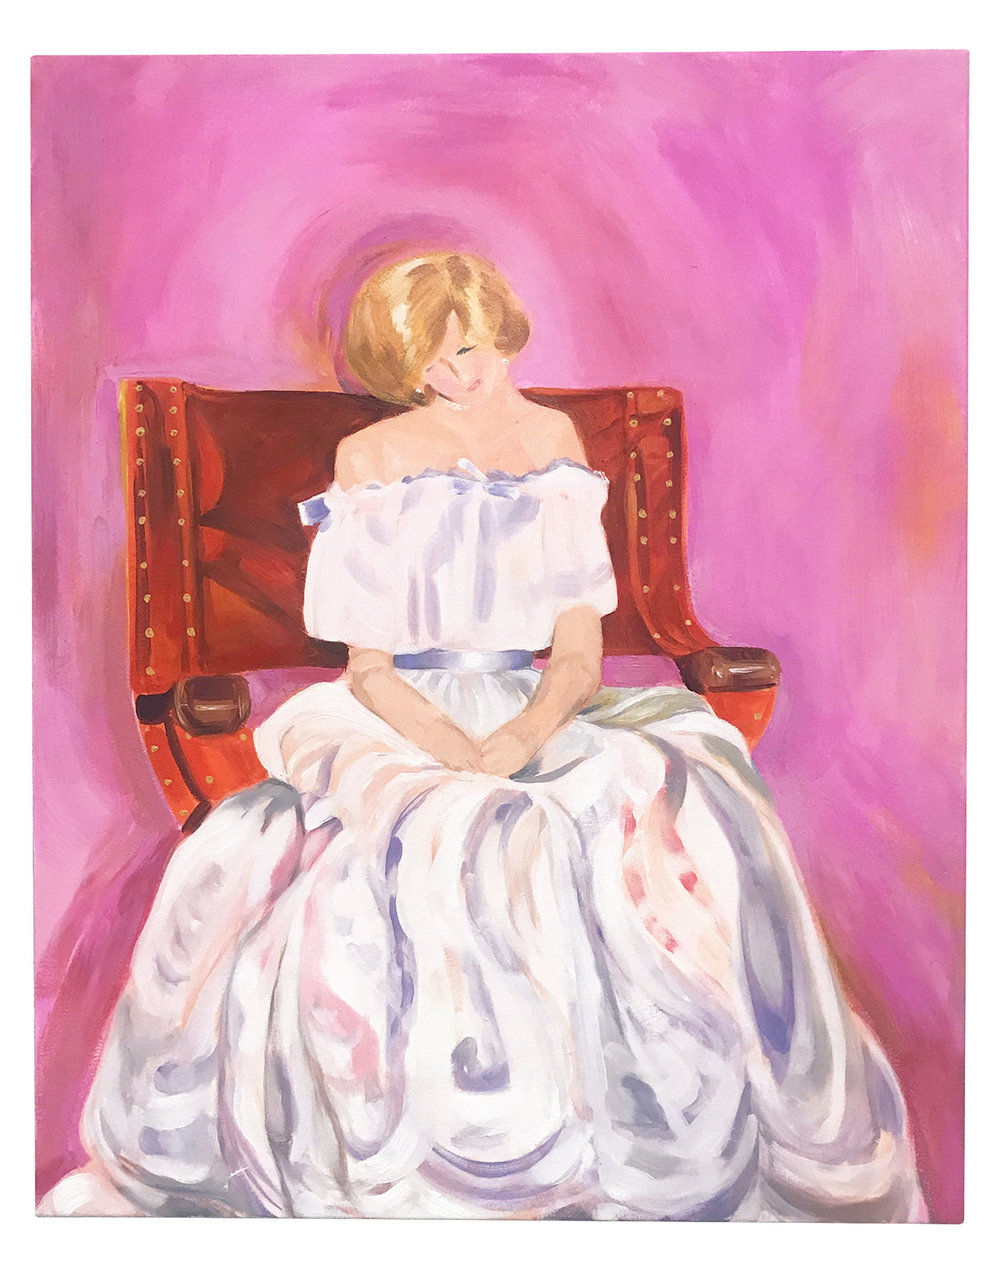 "MEEK & MILD 24"" x 30"" Oil on Canvas $540.00 |  BUY"